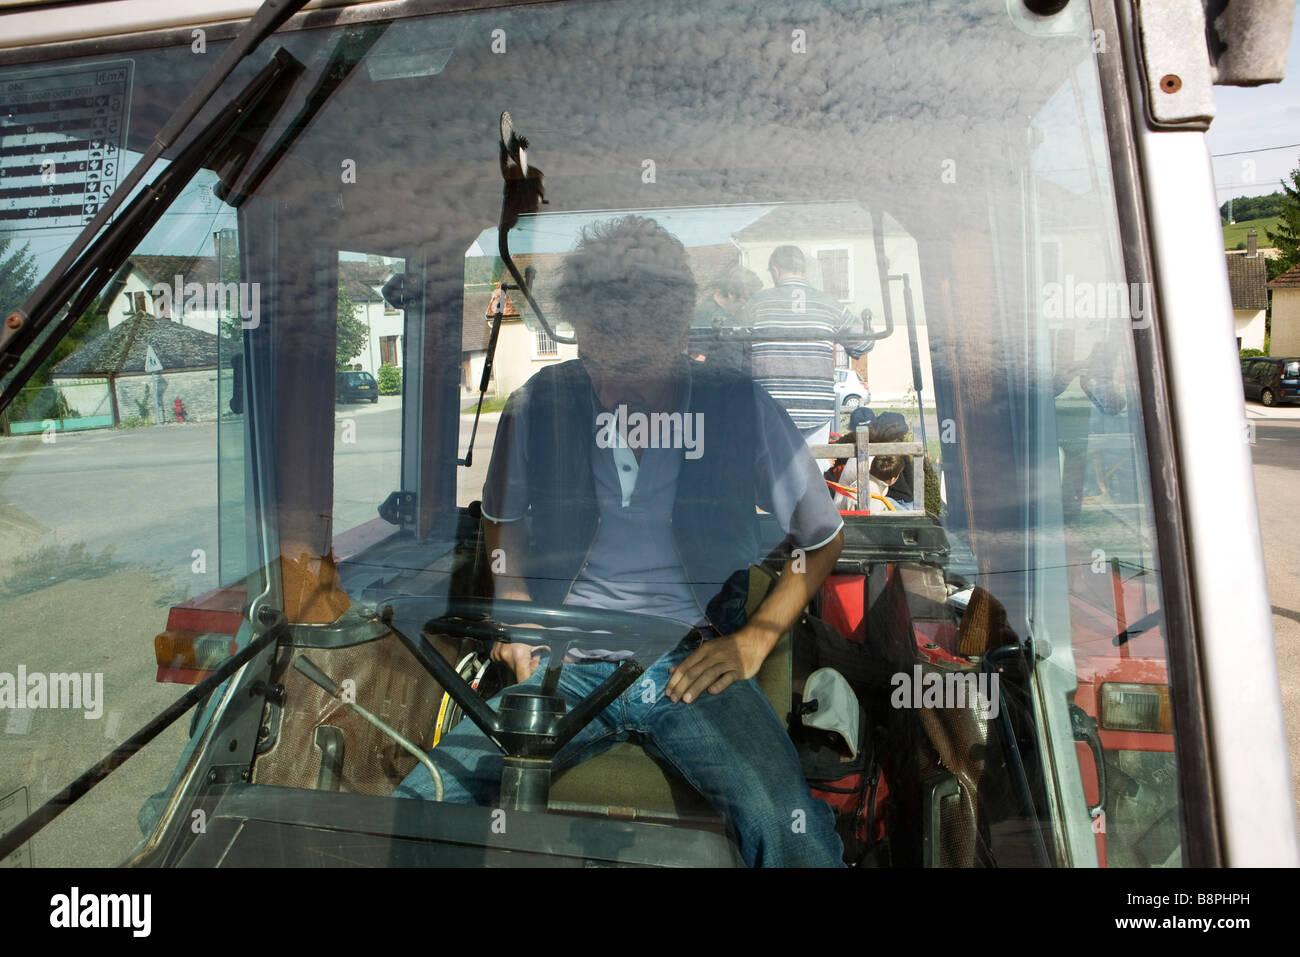 Frankreich, Champagne-Ardenne, Aube, Landarbeiter im Fahrzeug, blickte auf Lenkrad Stockbild